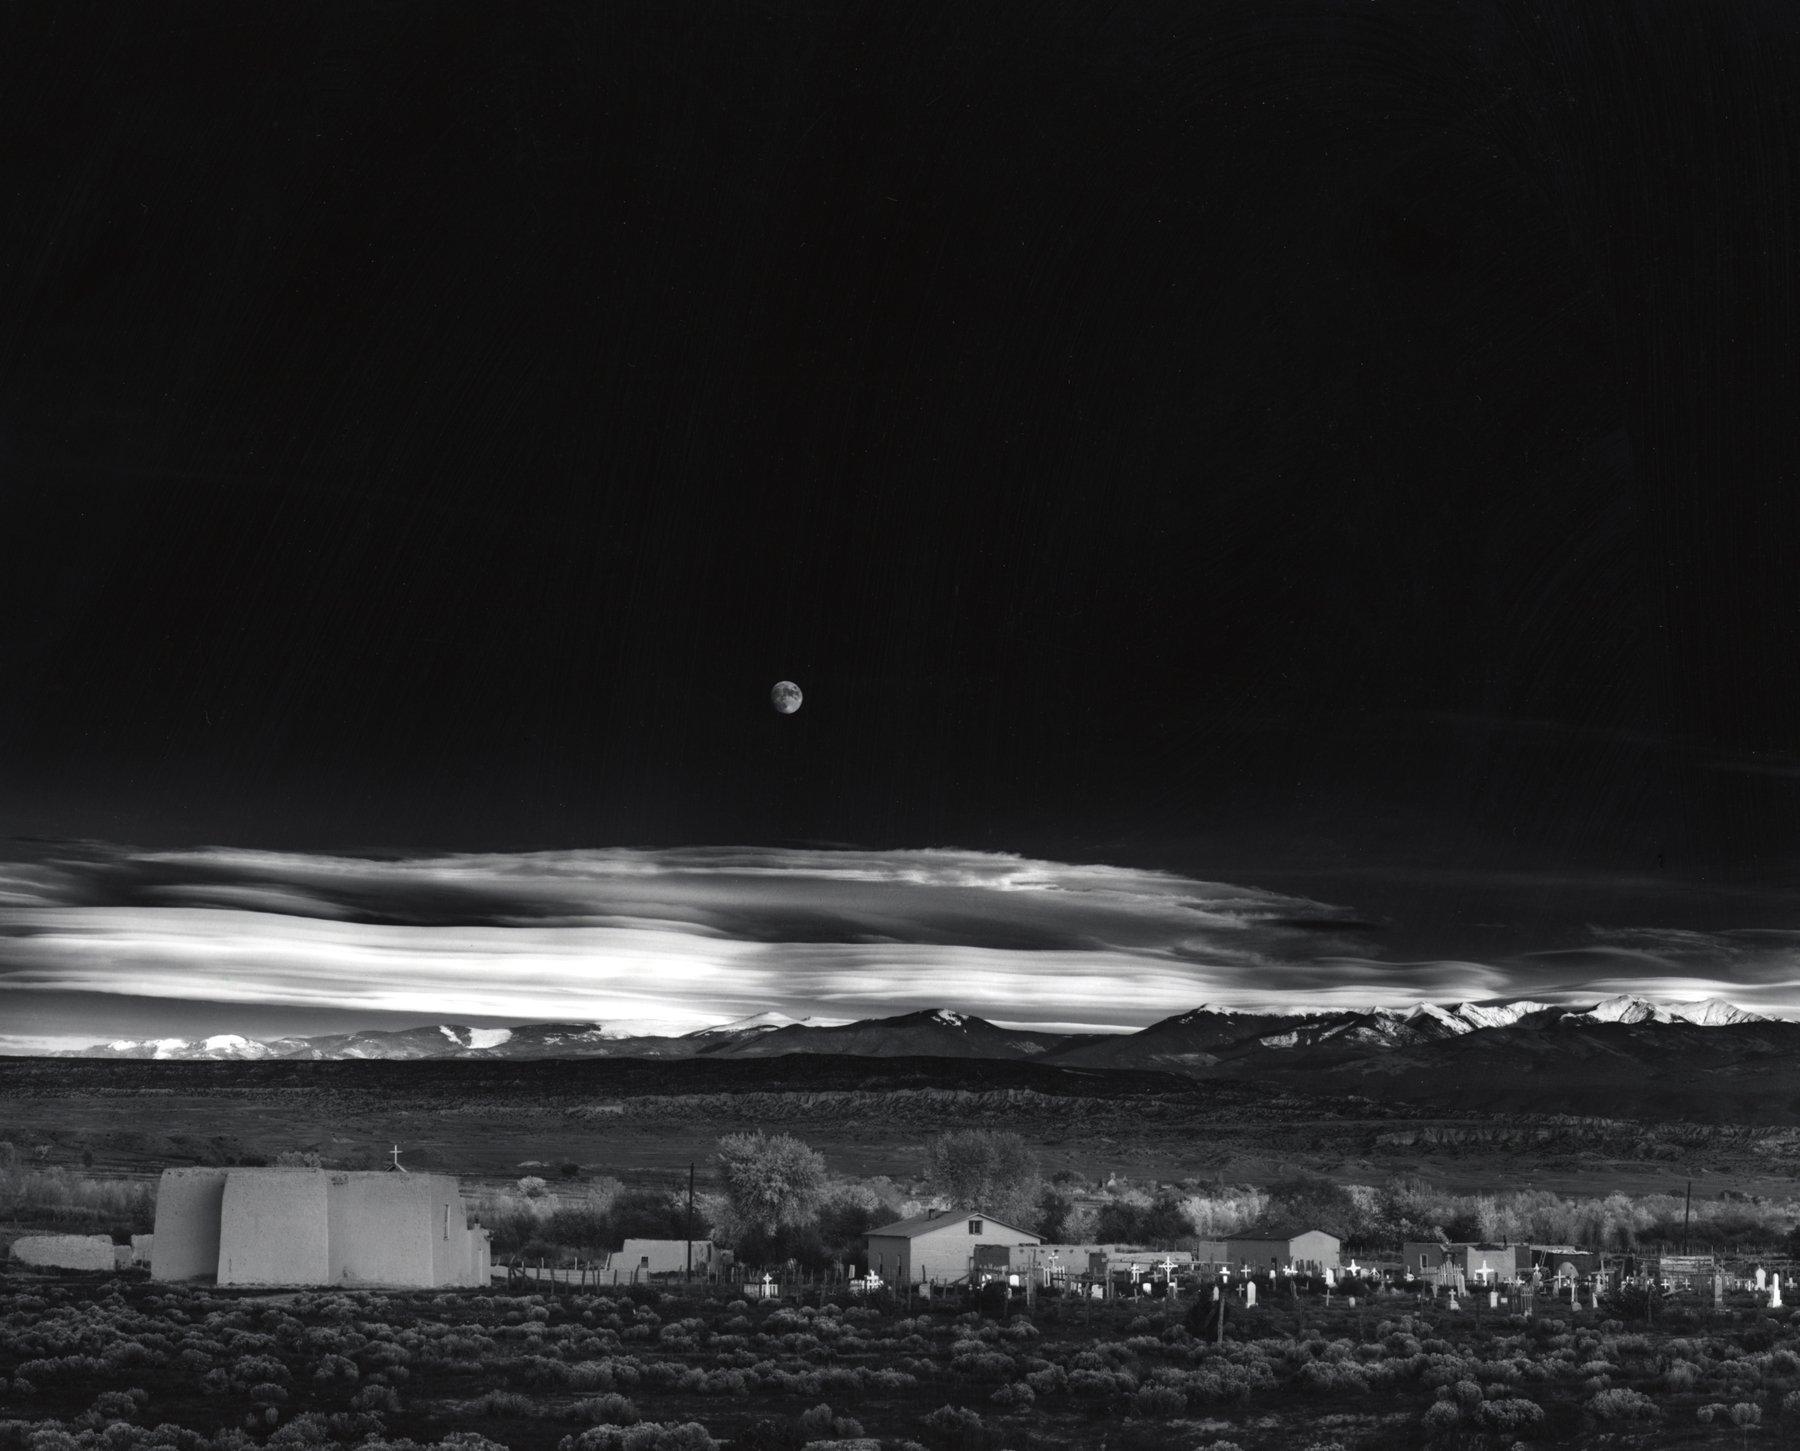 Ansel Adams : Moonrise, Hernandez. Tirage final